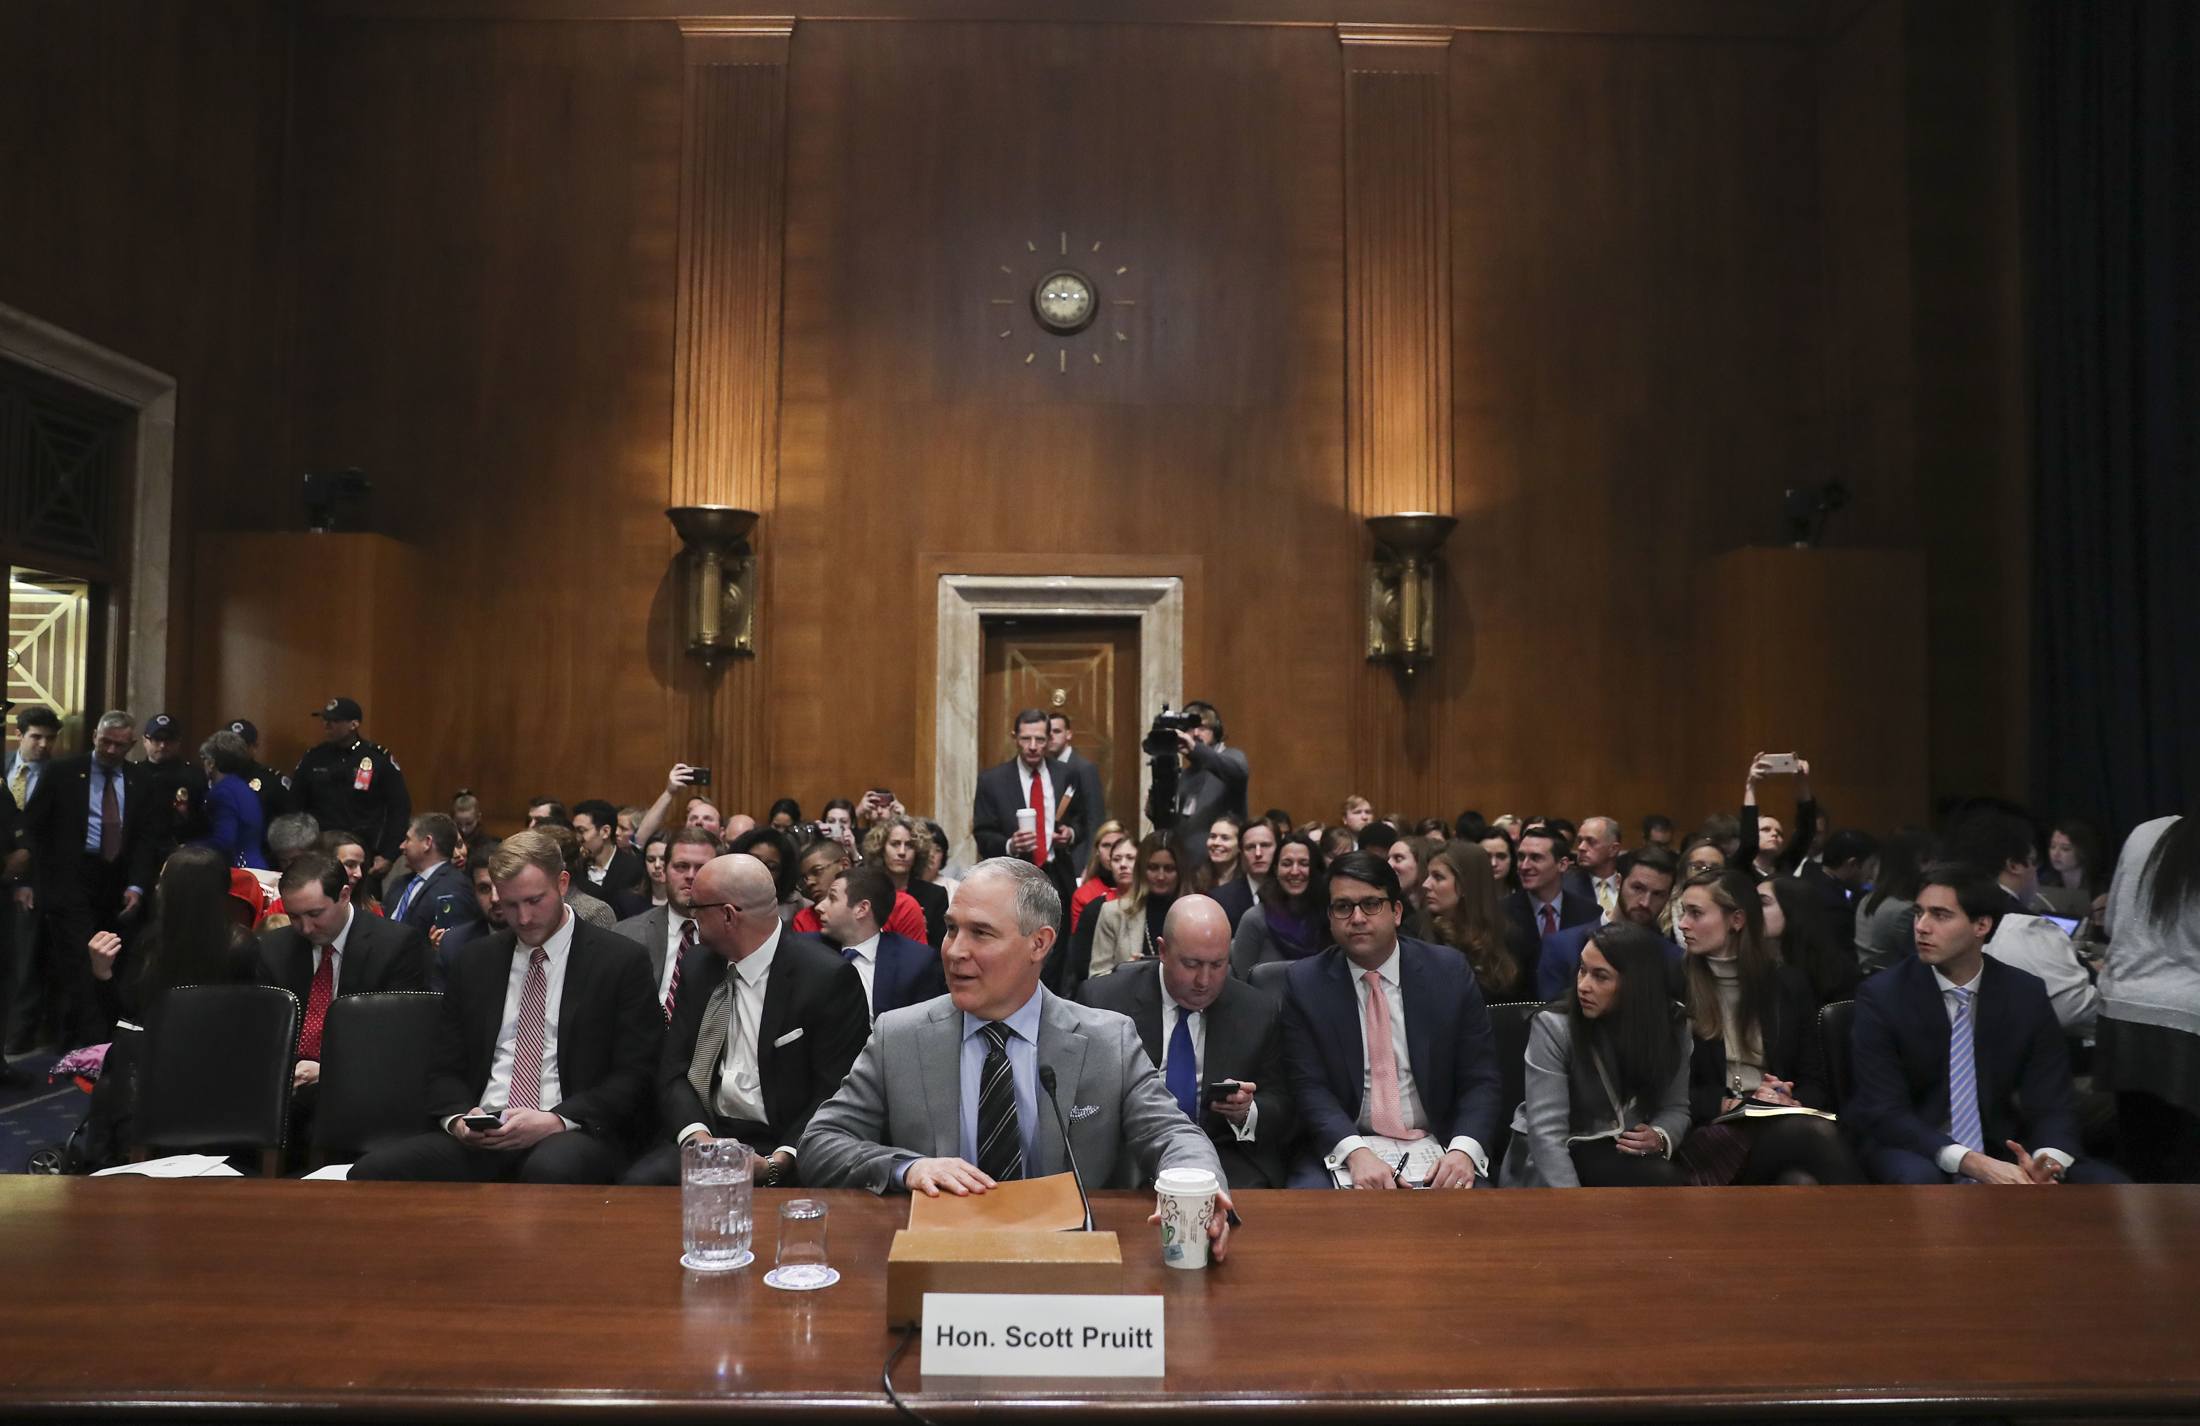 Environmental Protection Agency Administrator Scott Pruitt testifies before the Senate Environment Committee on Capitol Hill in Washington, Tuesday, Jan. 30, 2018. (Pablo Martinez Monsivais/AP)